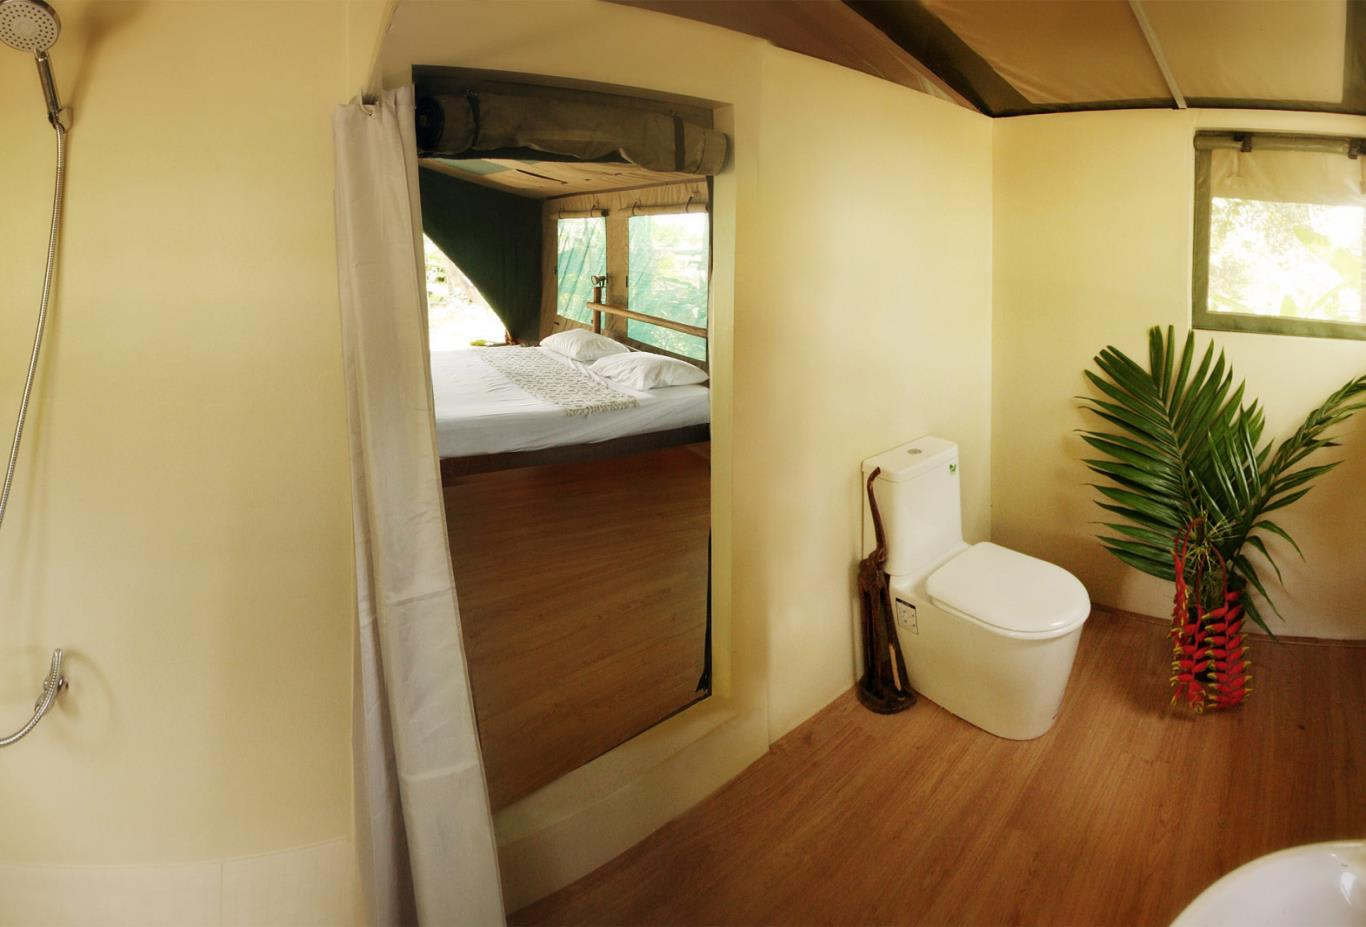 Camp-bathroom